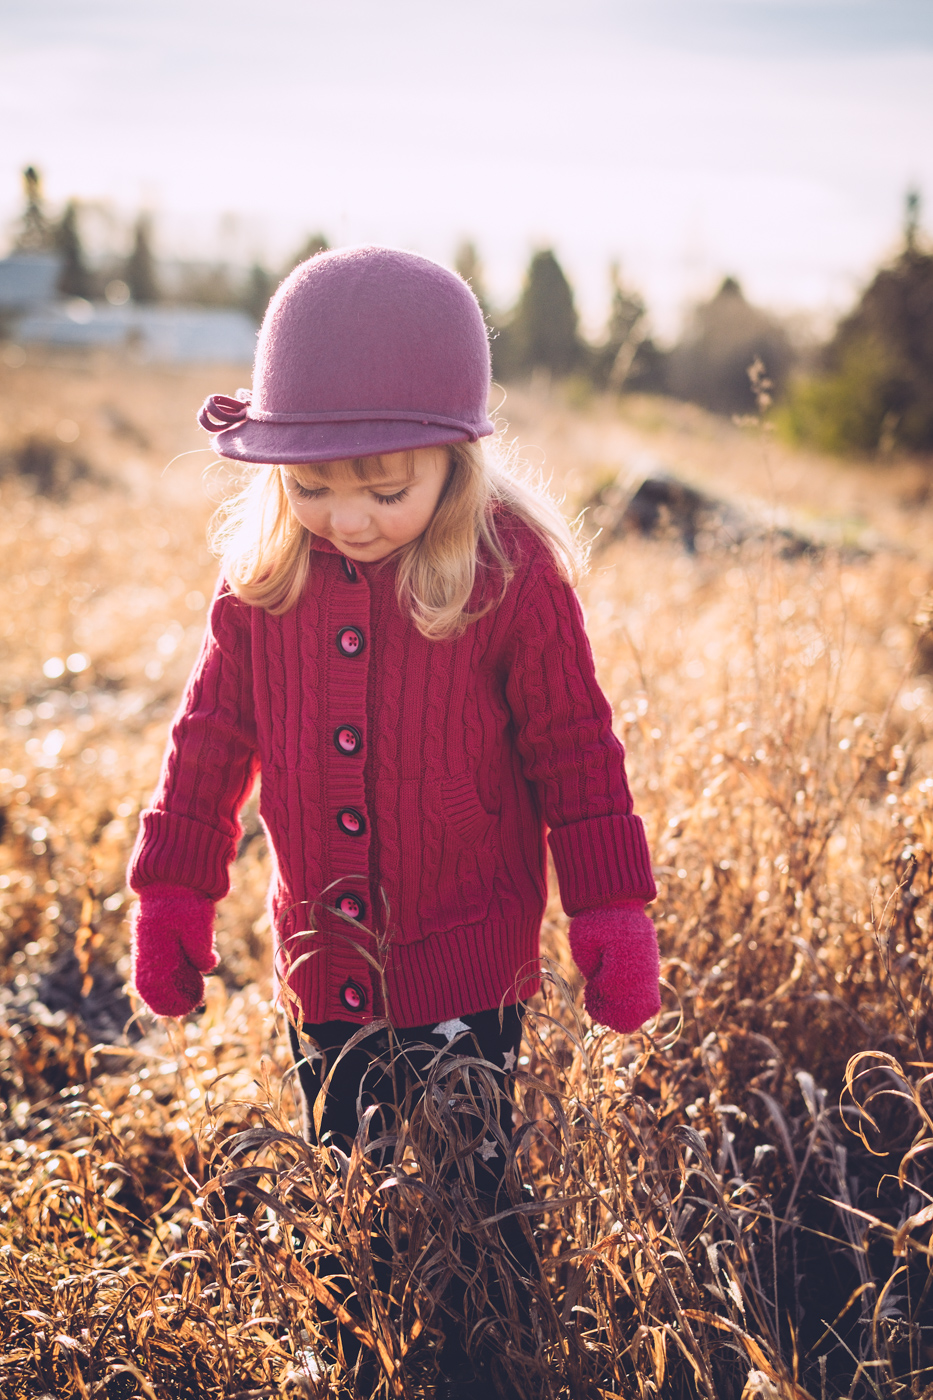 Chloe_Portraits_Blog-11.jpg